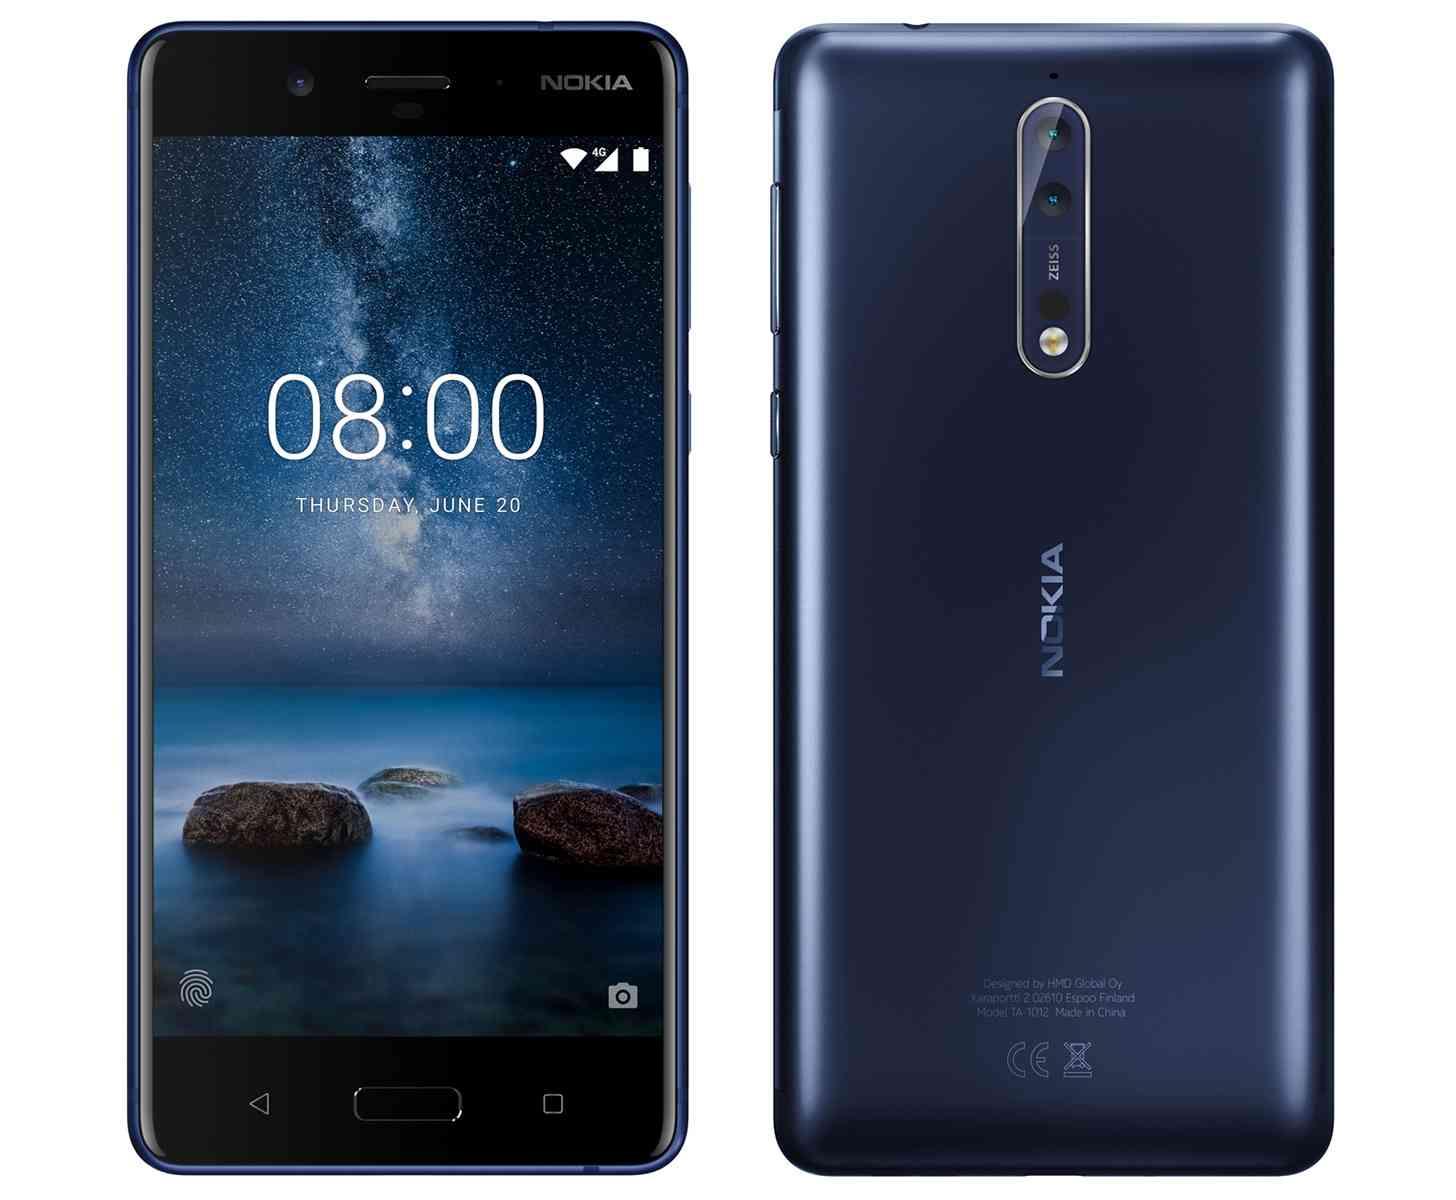 Nokia 8 image leak